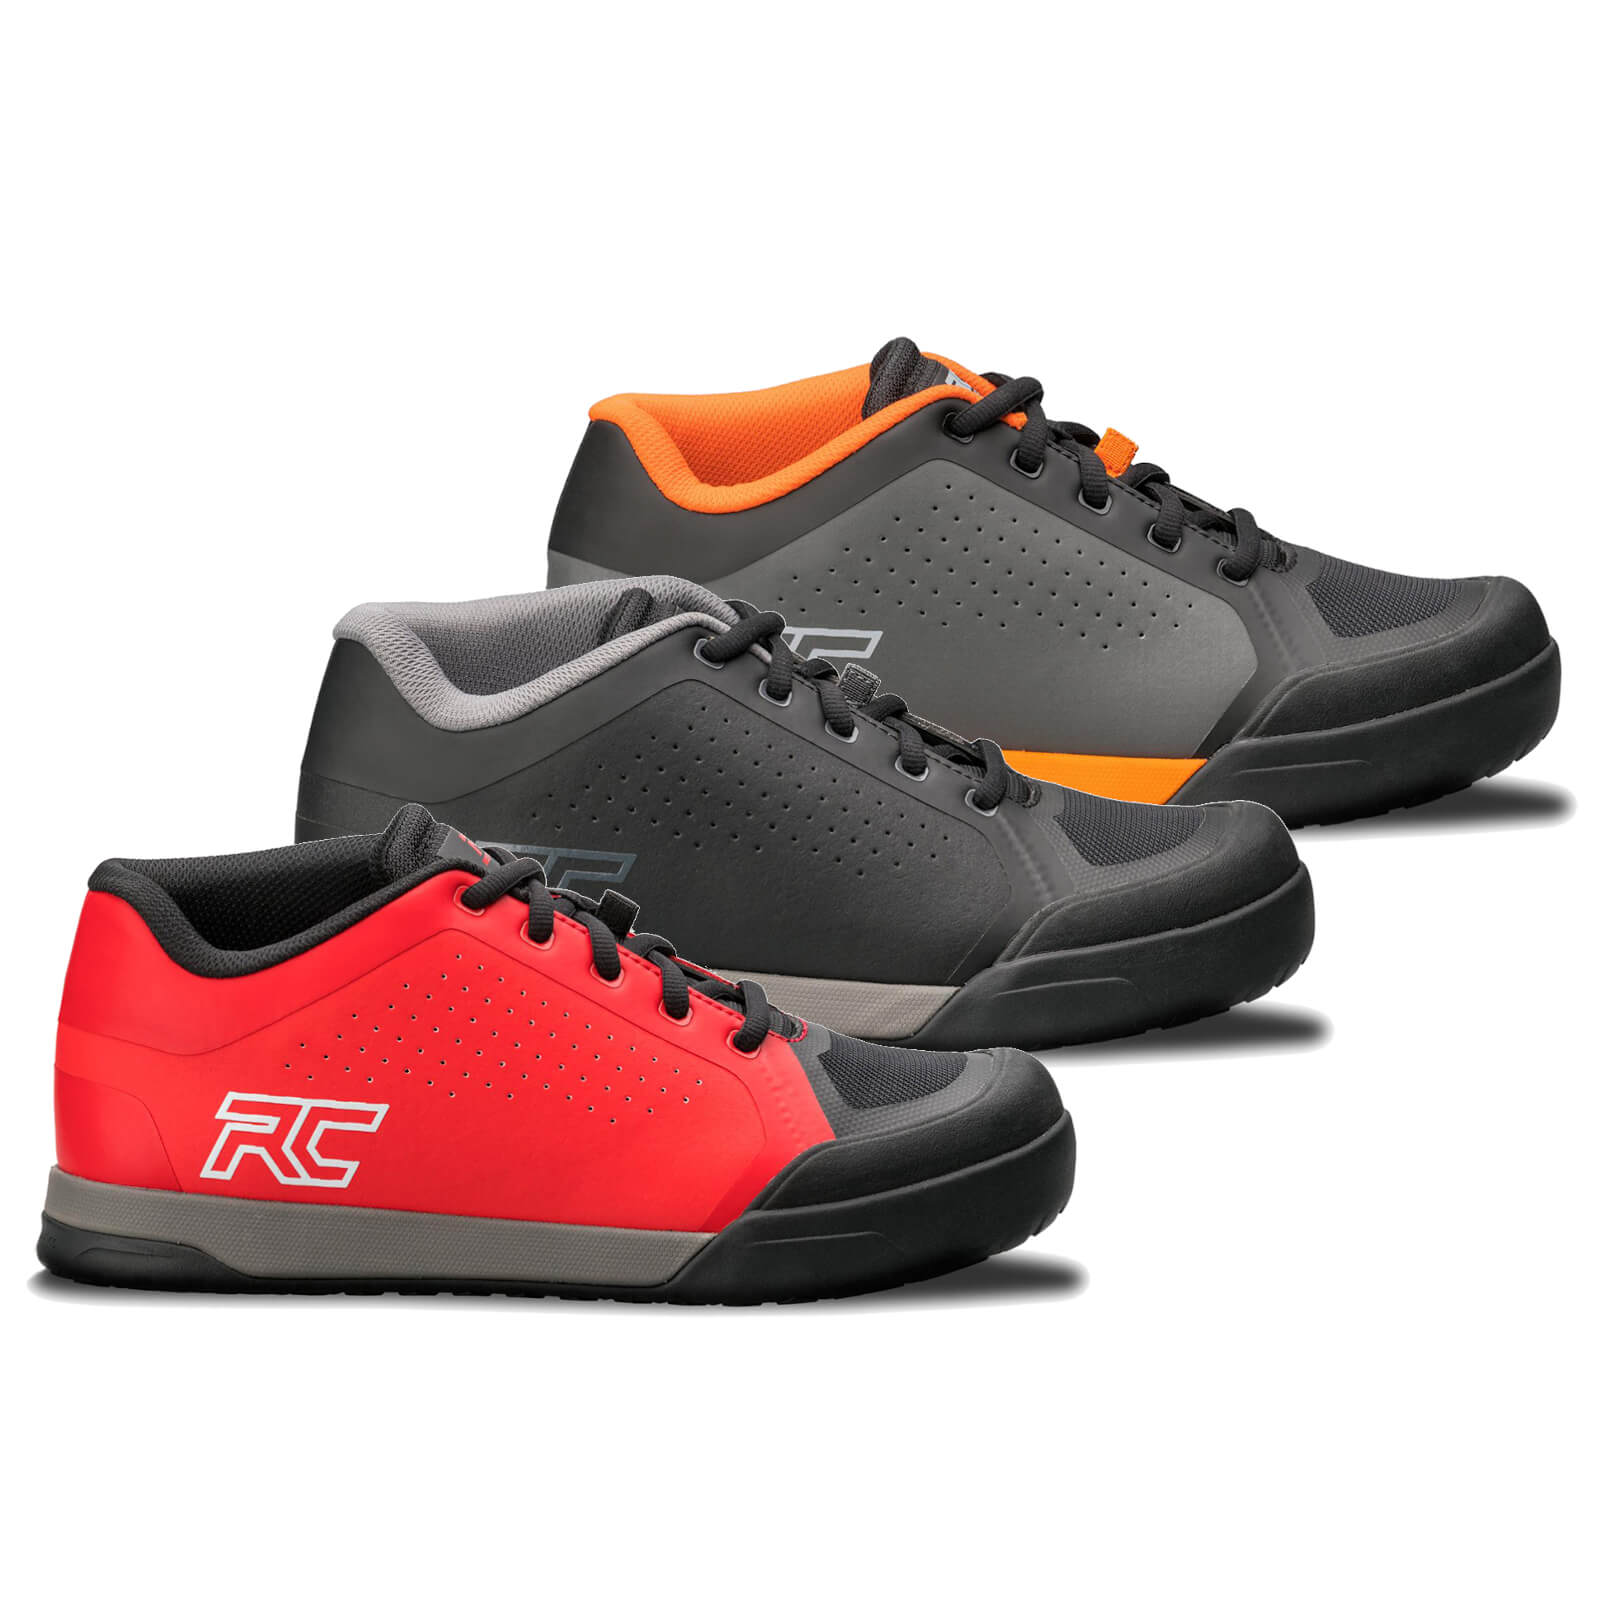 Ride Concepts Powerline Flat MTB Shoes - UK 8.5/EU 42.5 - Black/Charcoal